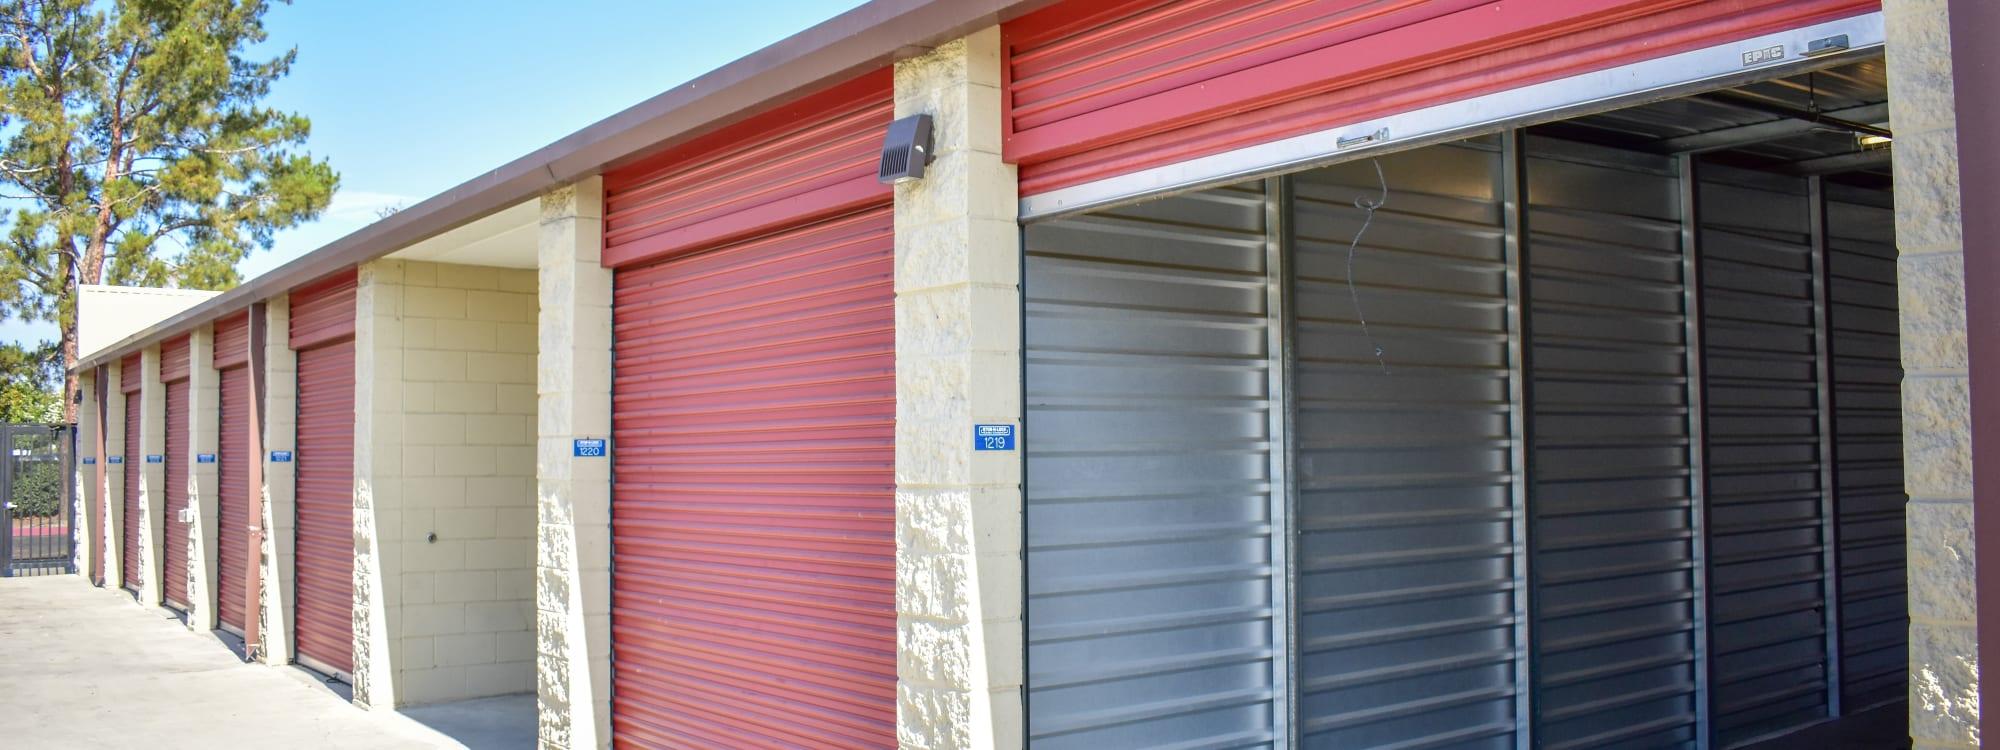 Self storage options at STOR-N-LOCK Self Storage in Rancho Cucamonga, California